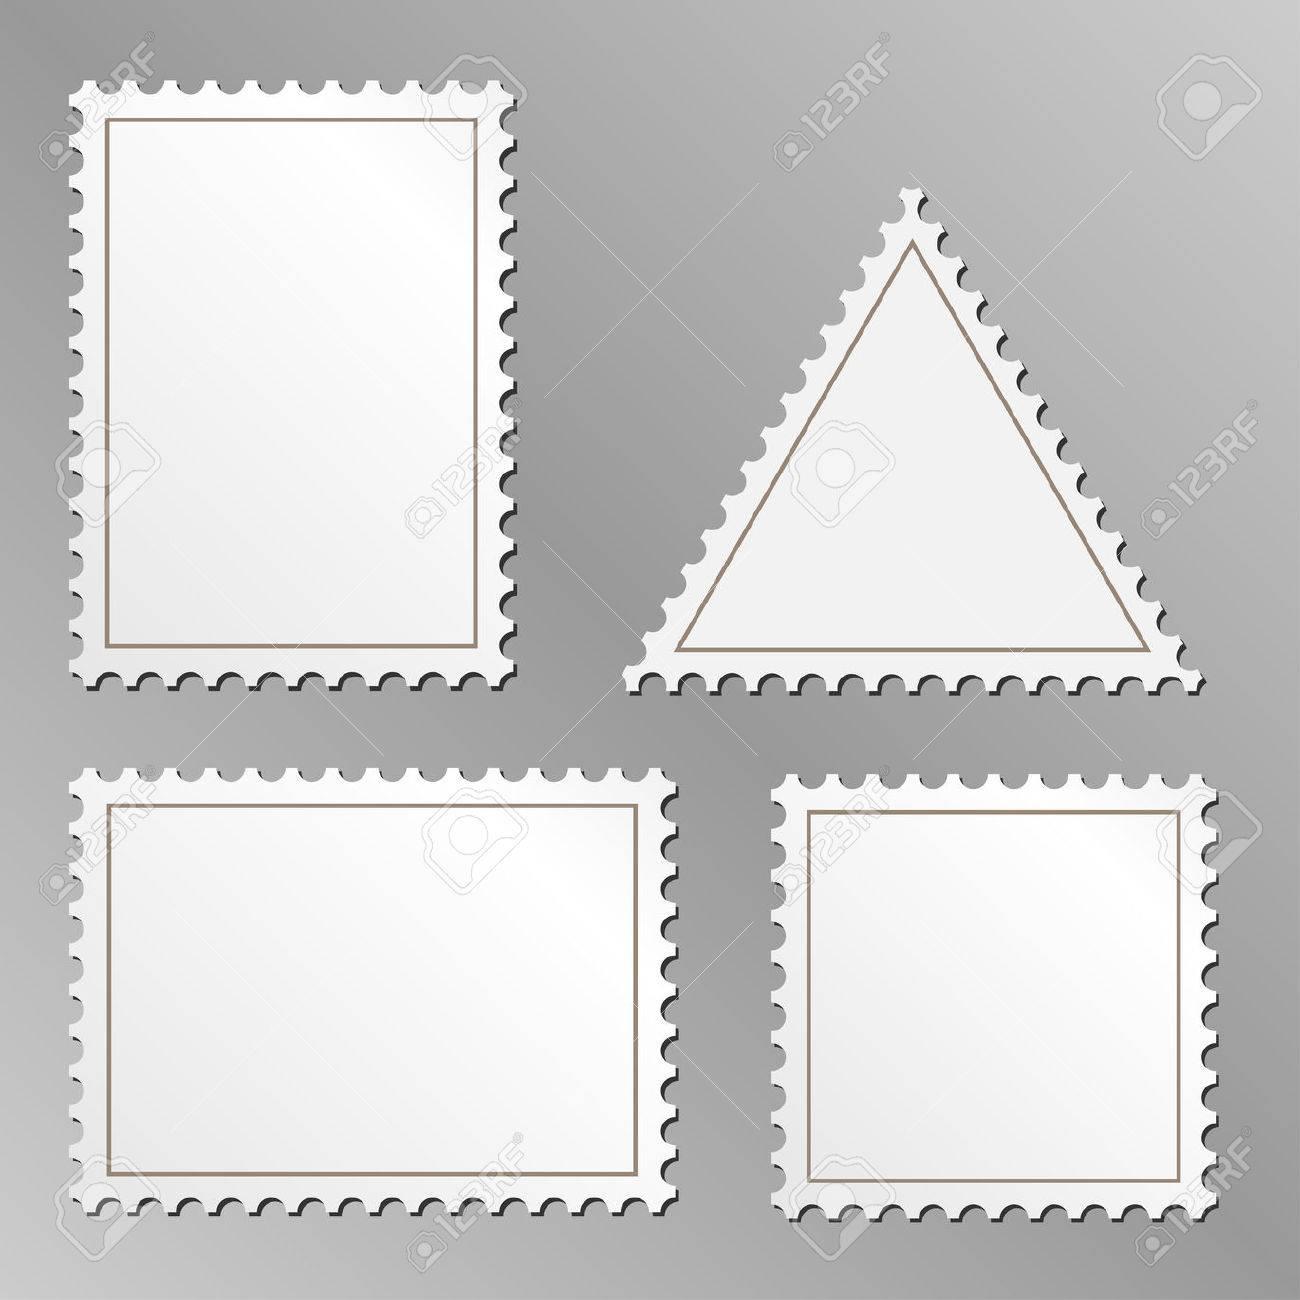 Italian handwritten postcard letter stock photo image 39254147 - Italian Handwritten Postcard Letter Stock Photo Image 39254147 Vector Set Of Blank Postage Blank Mail